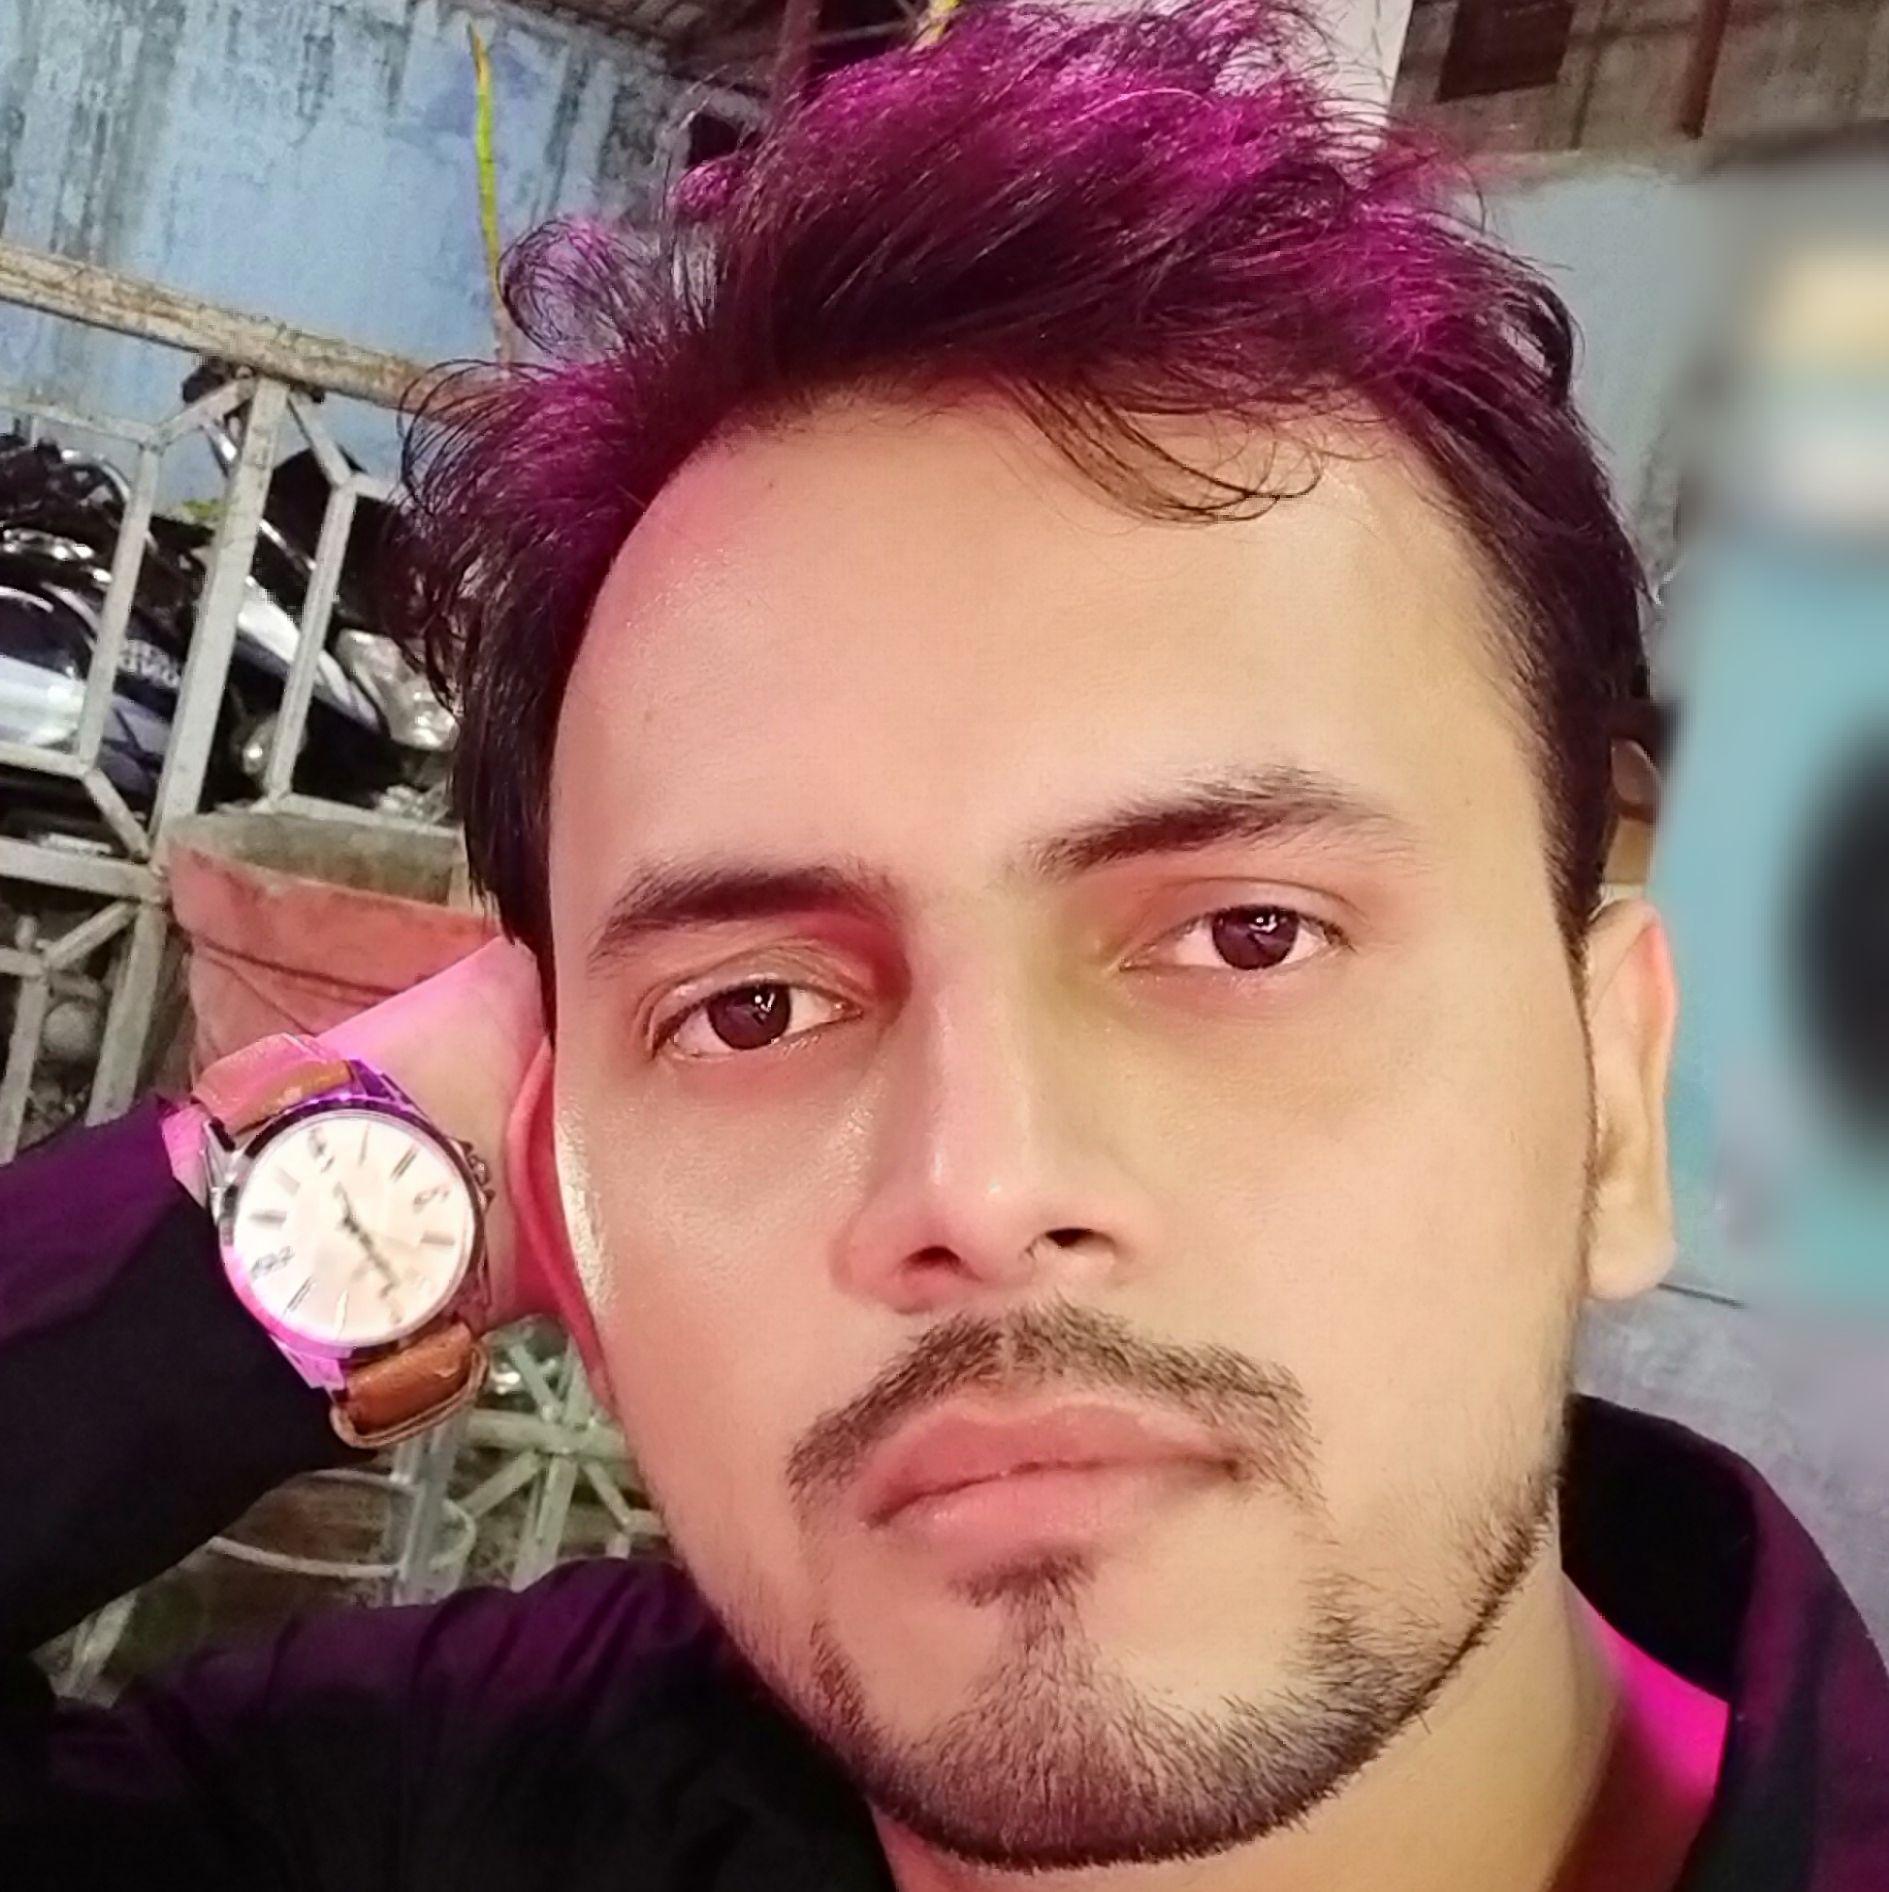 Ajay Singh Sikarwar